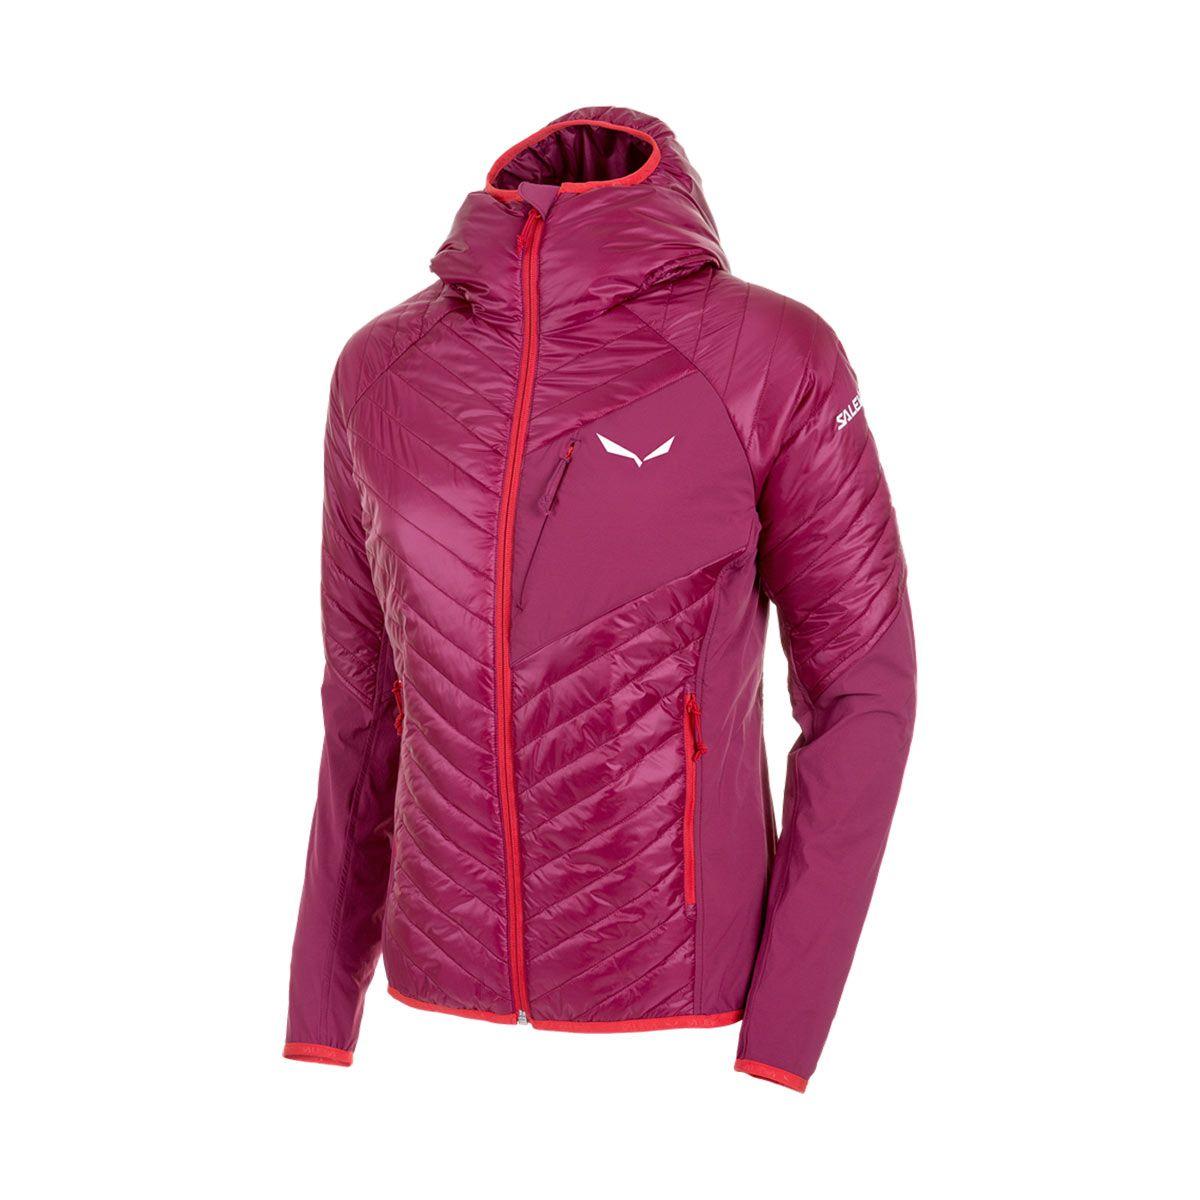 The Salewa Women's Ortles Hybrid 2 Primaloft Jacket is a